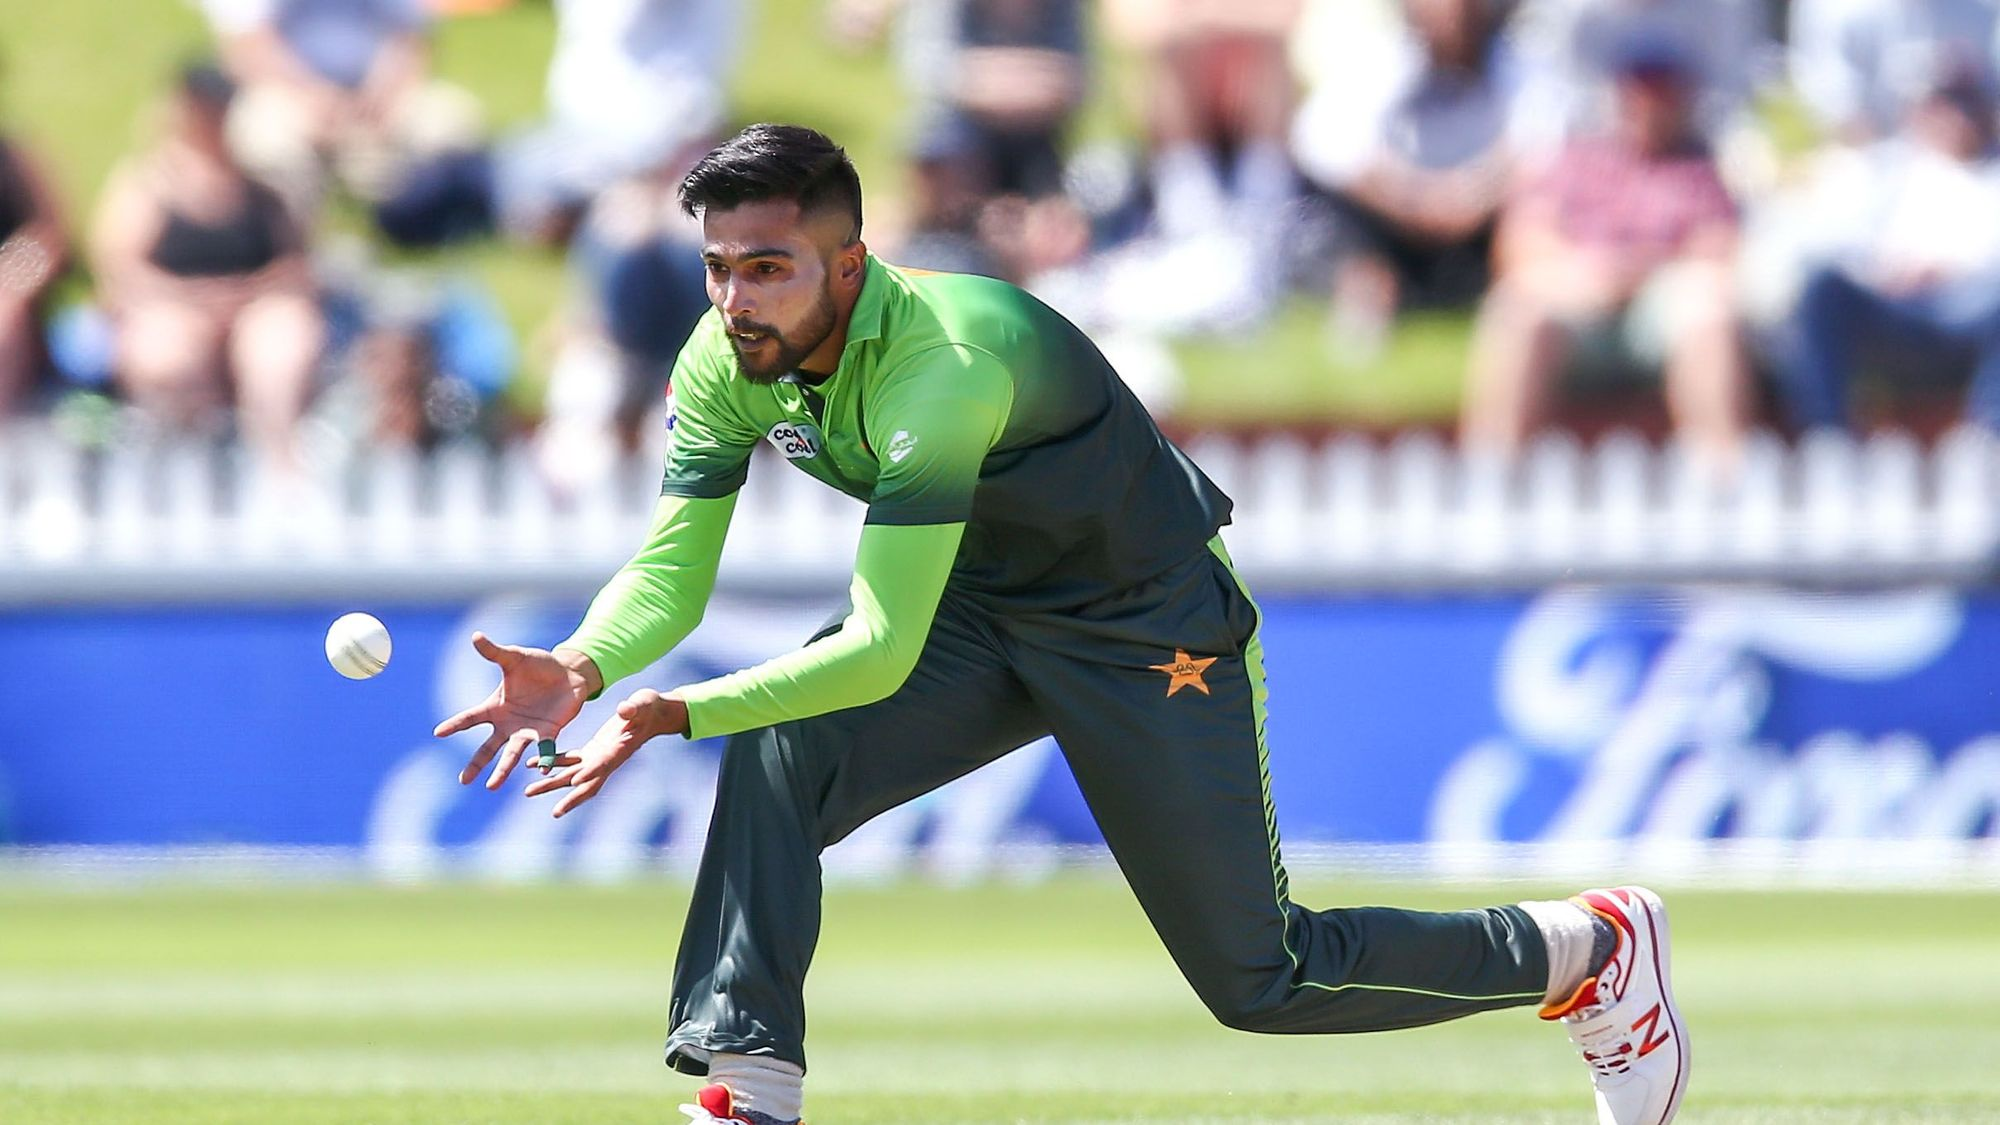 dc6621ab760 Live Cricket Scores   News - ICC Cricket World Cup 2019